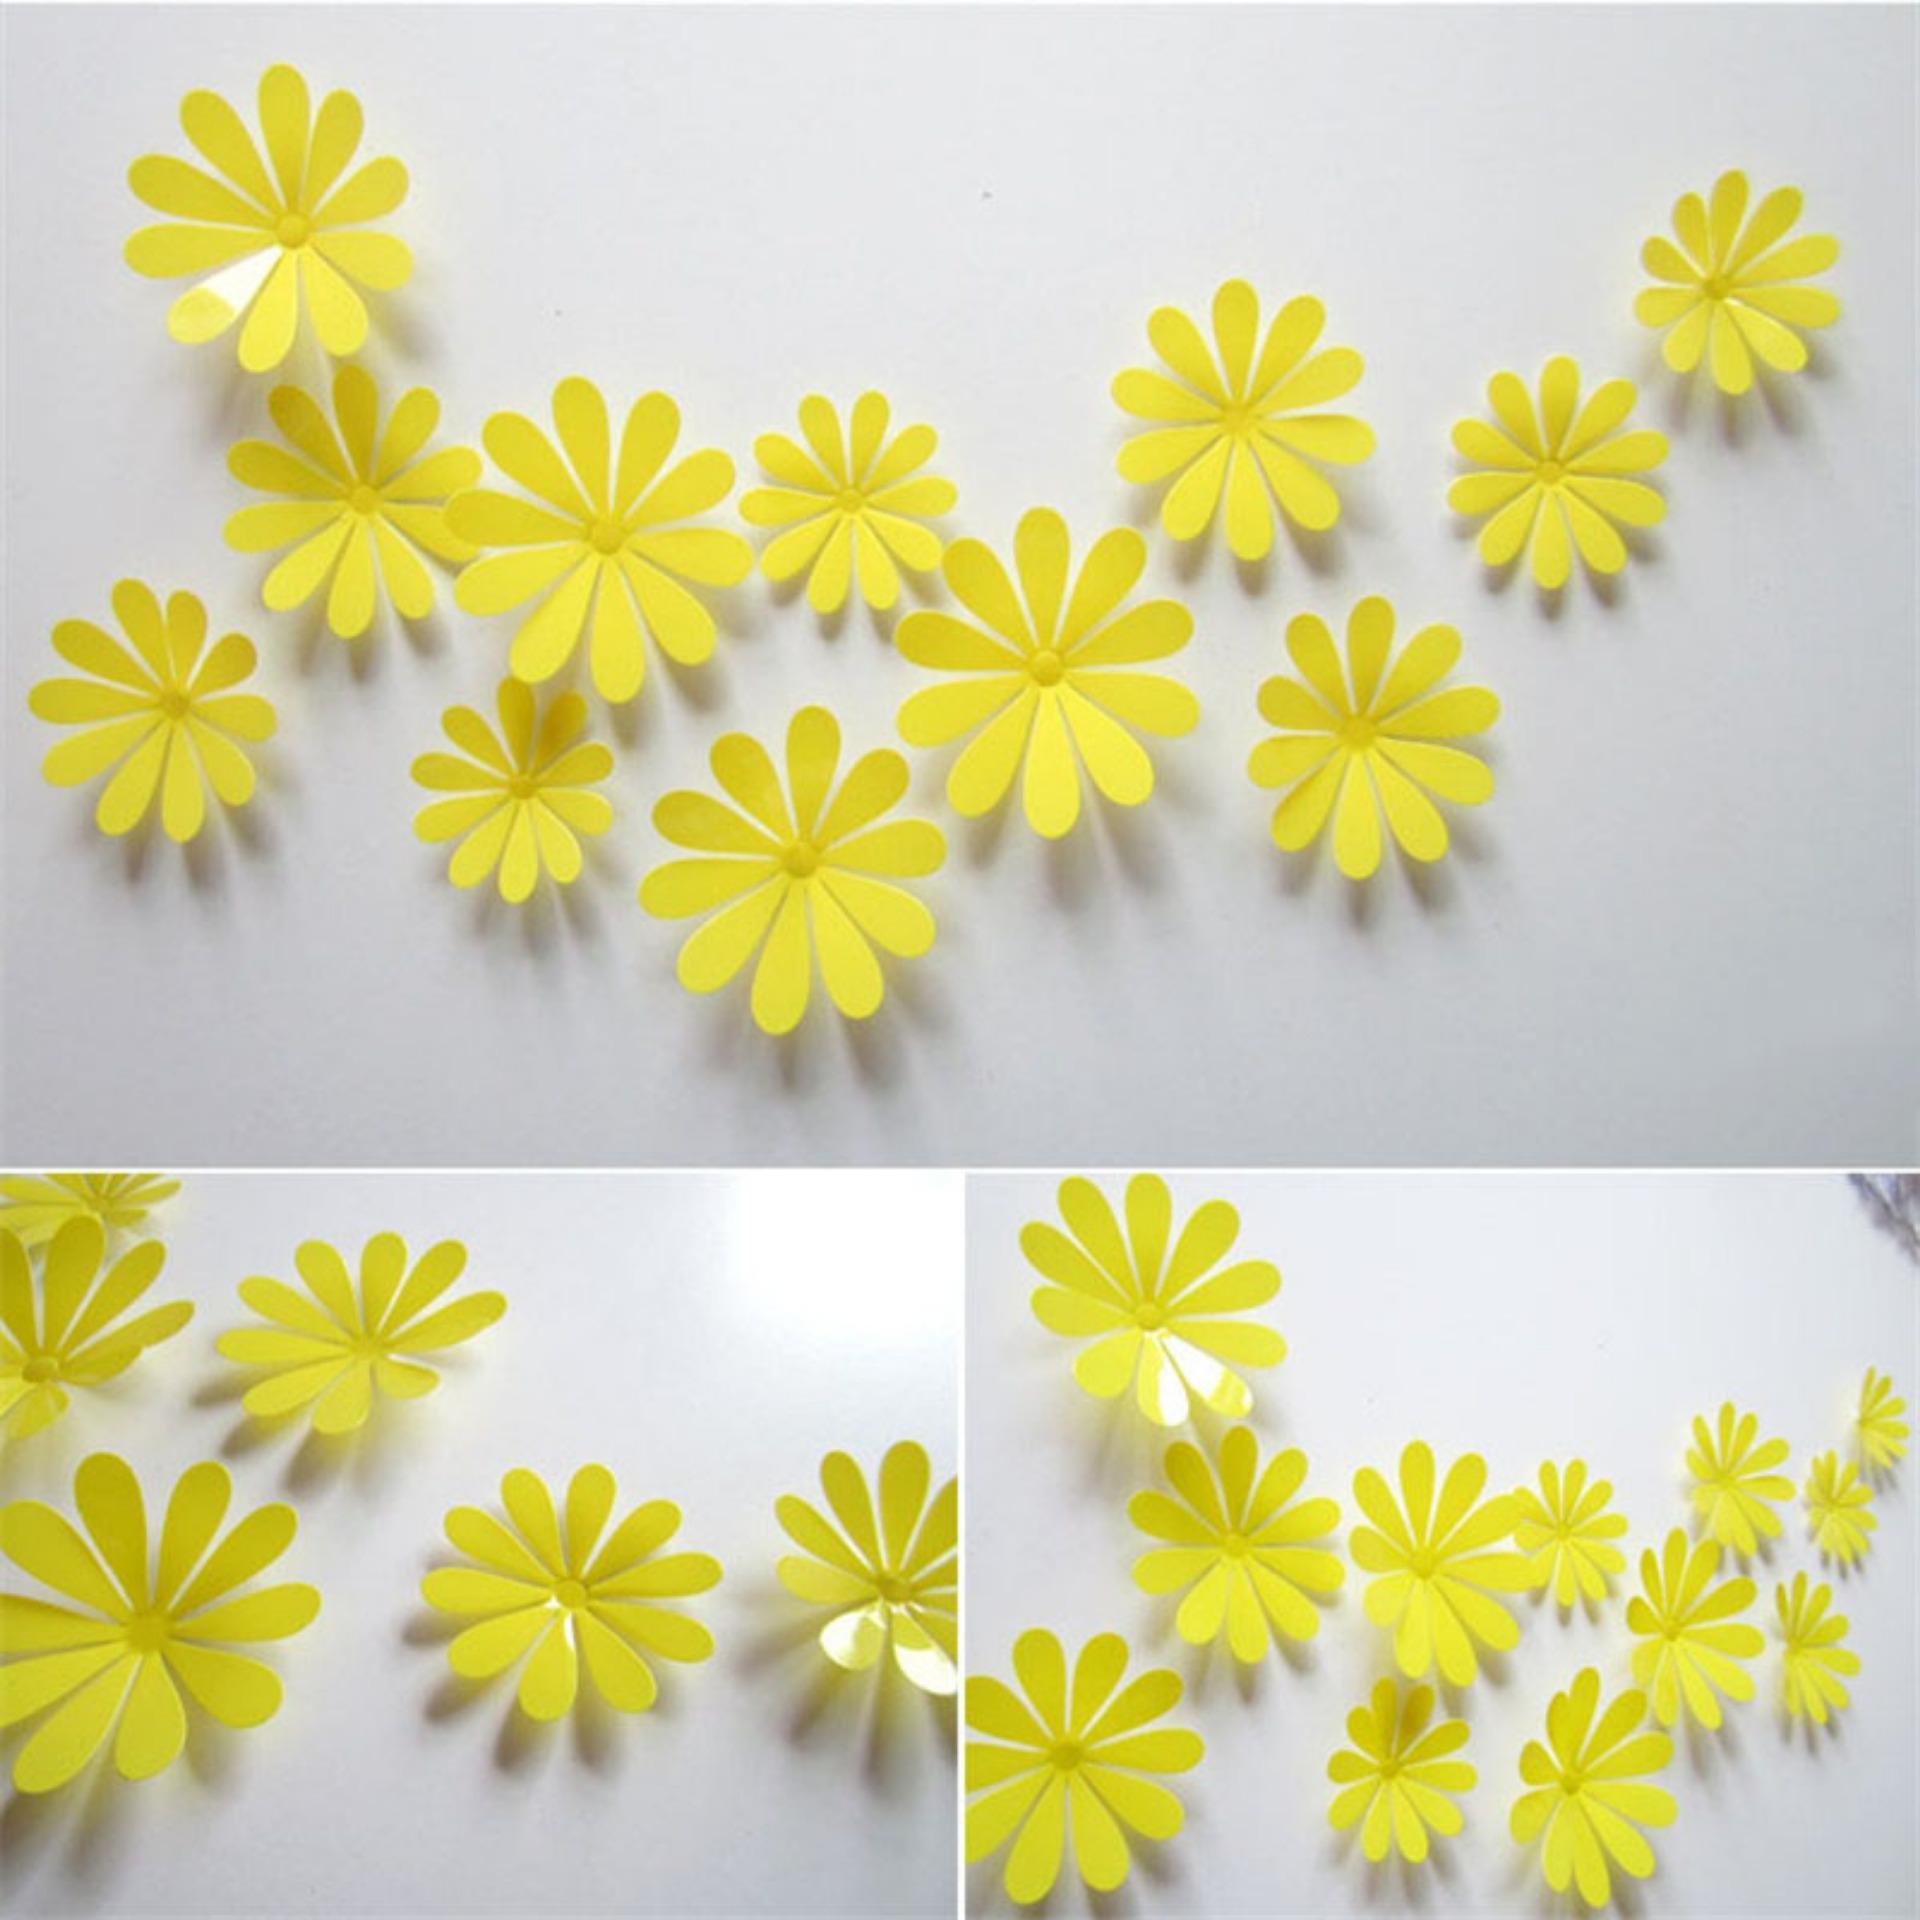 Colorful 3d Flower Wall Decor Diy Model - Art & Wall Decor ...